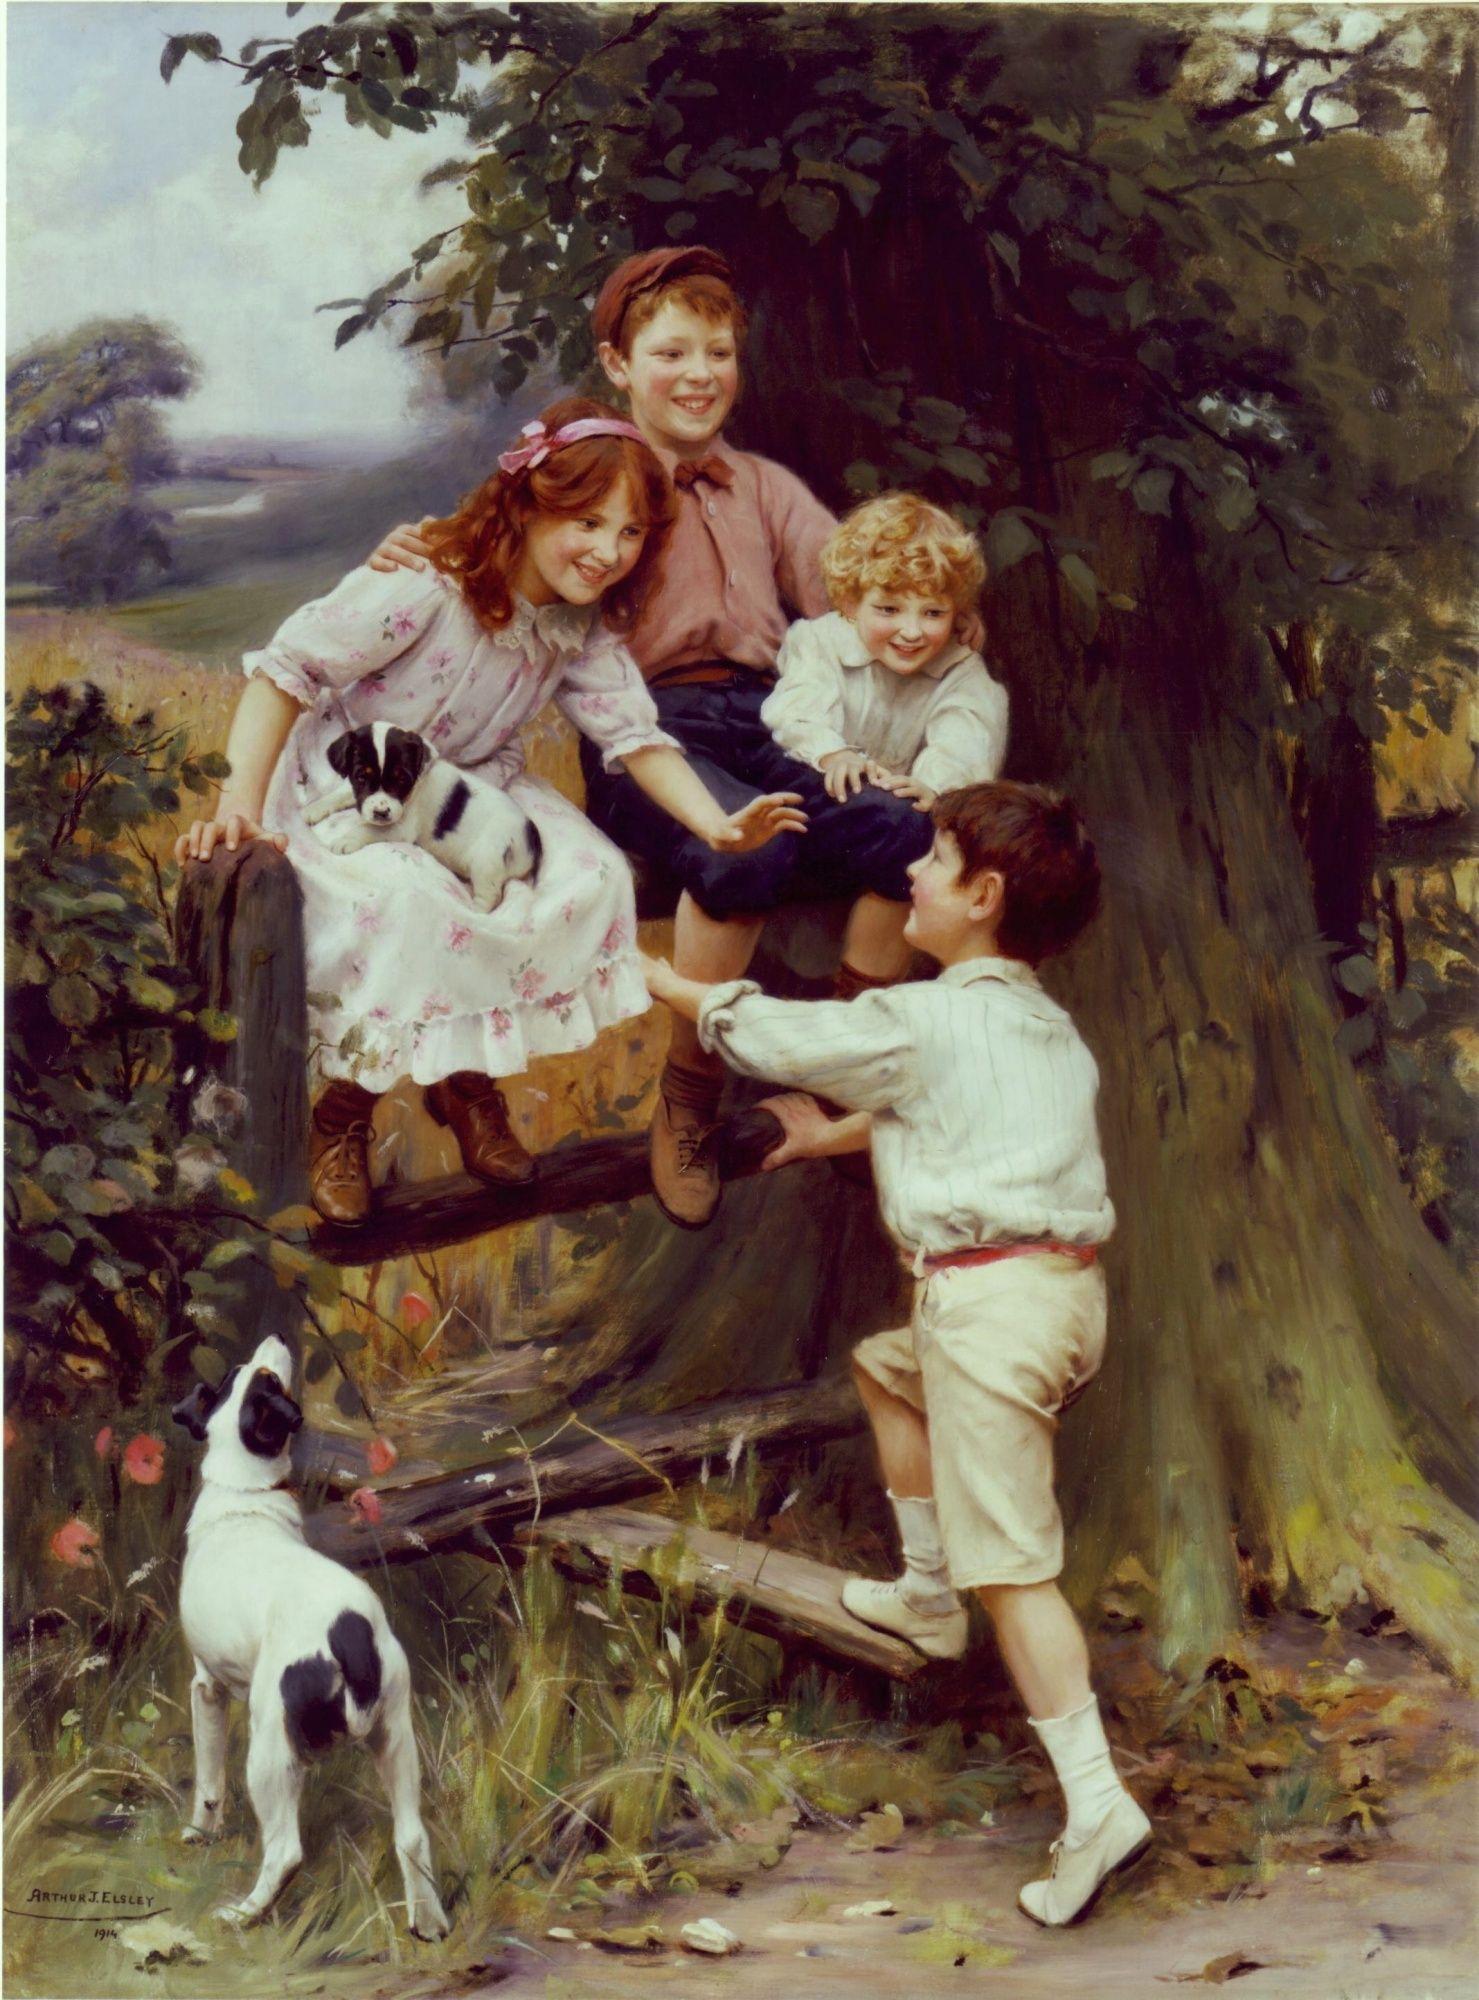 Arthur Elsley | Summer Day, Oil on Canvas | 46 x 34 inches ( 117 x 86 cm )